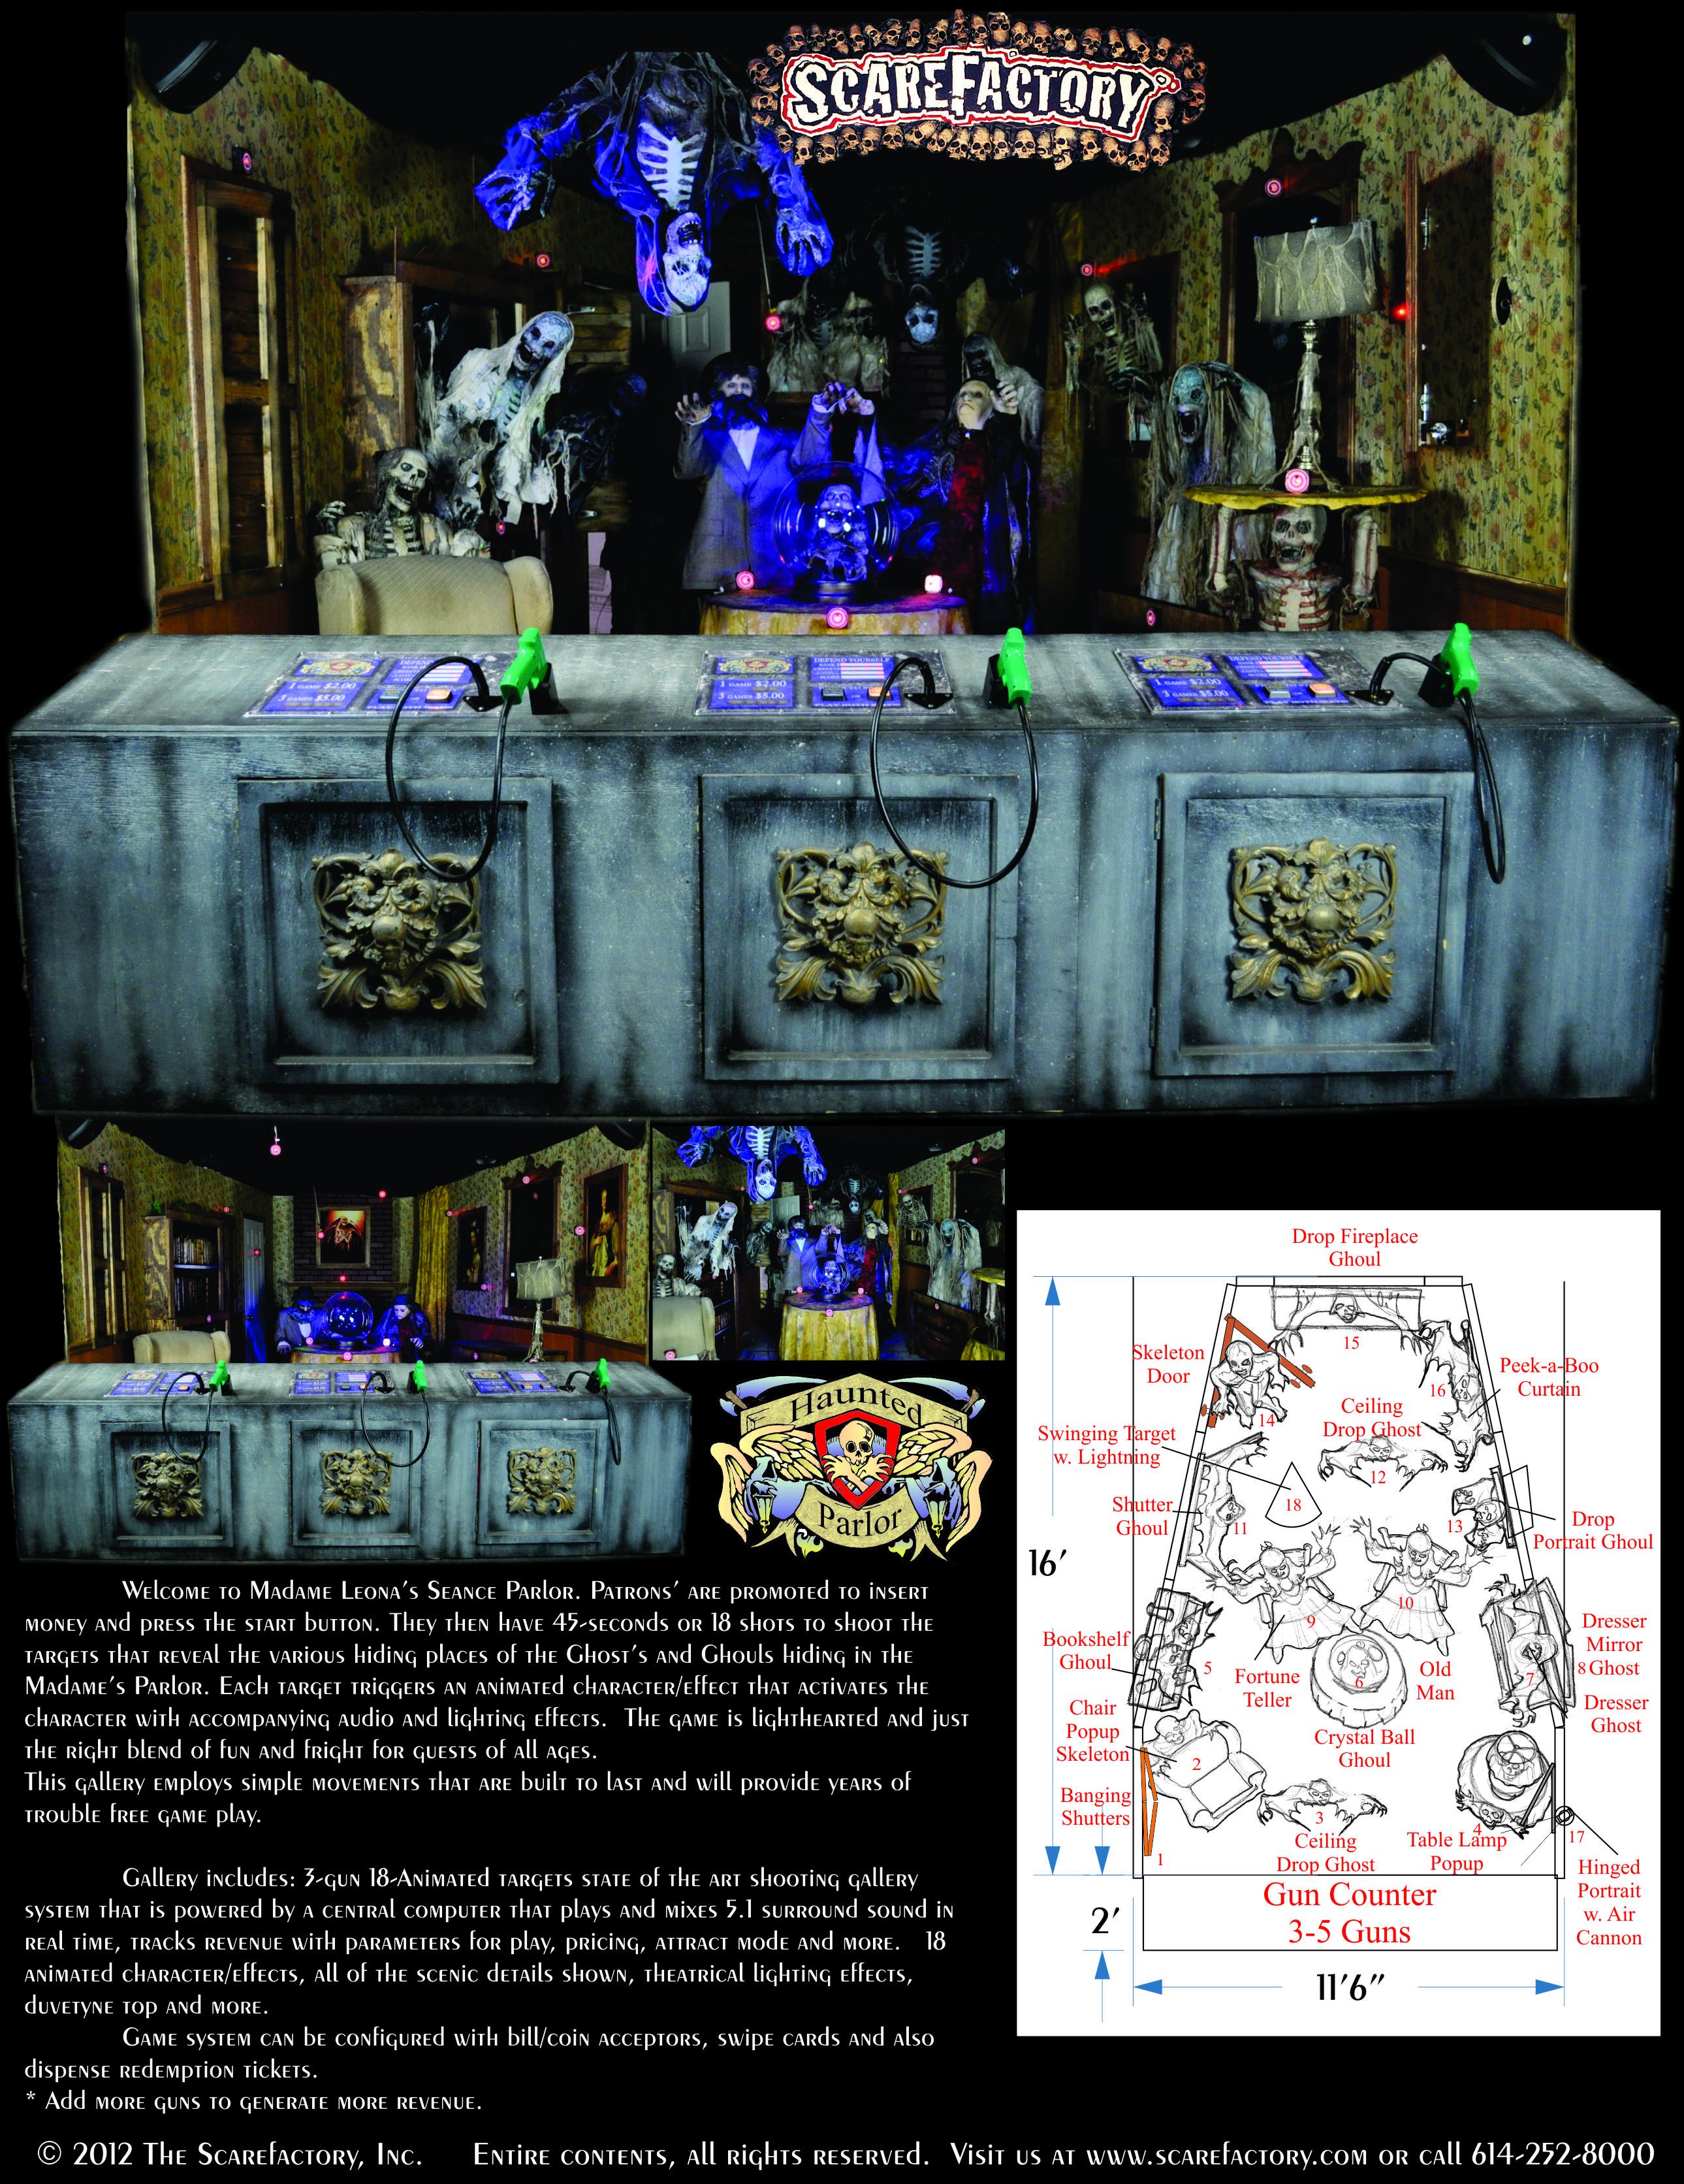 Gallery-HauntedParlor